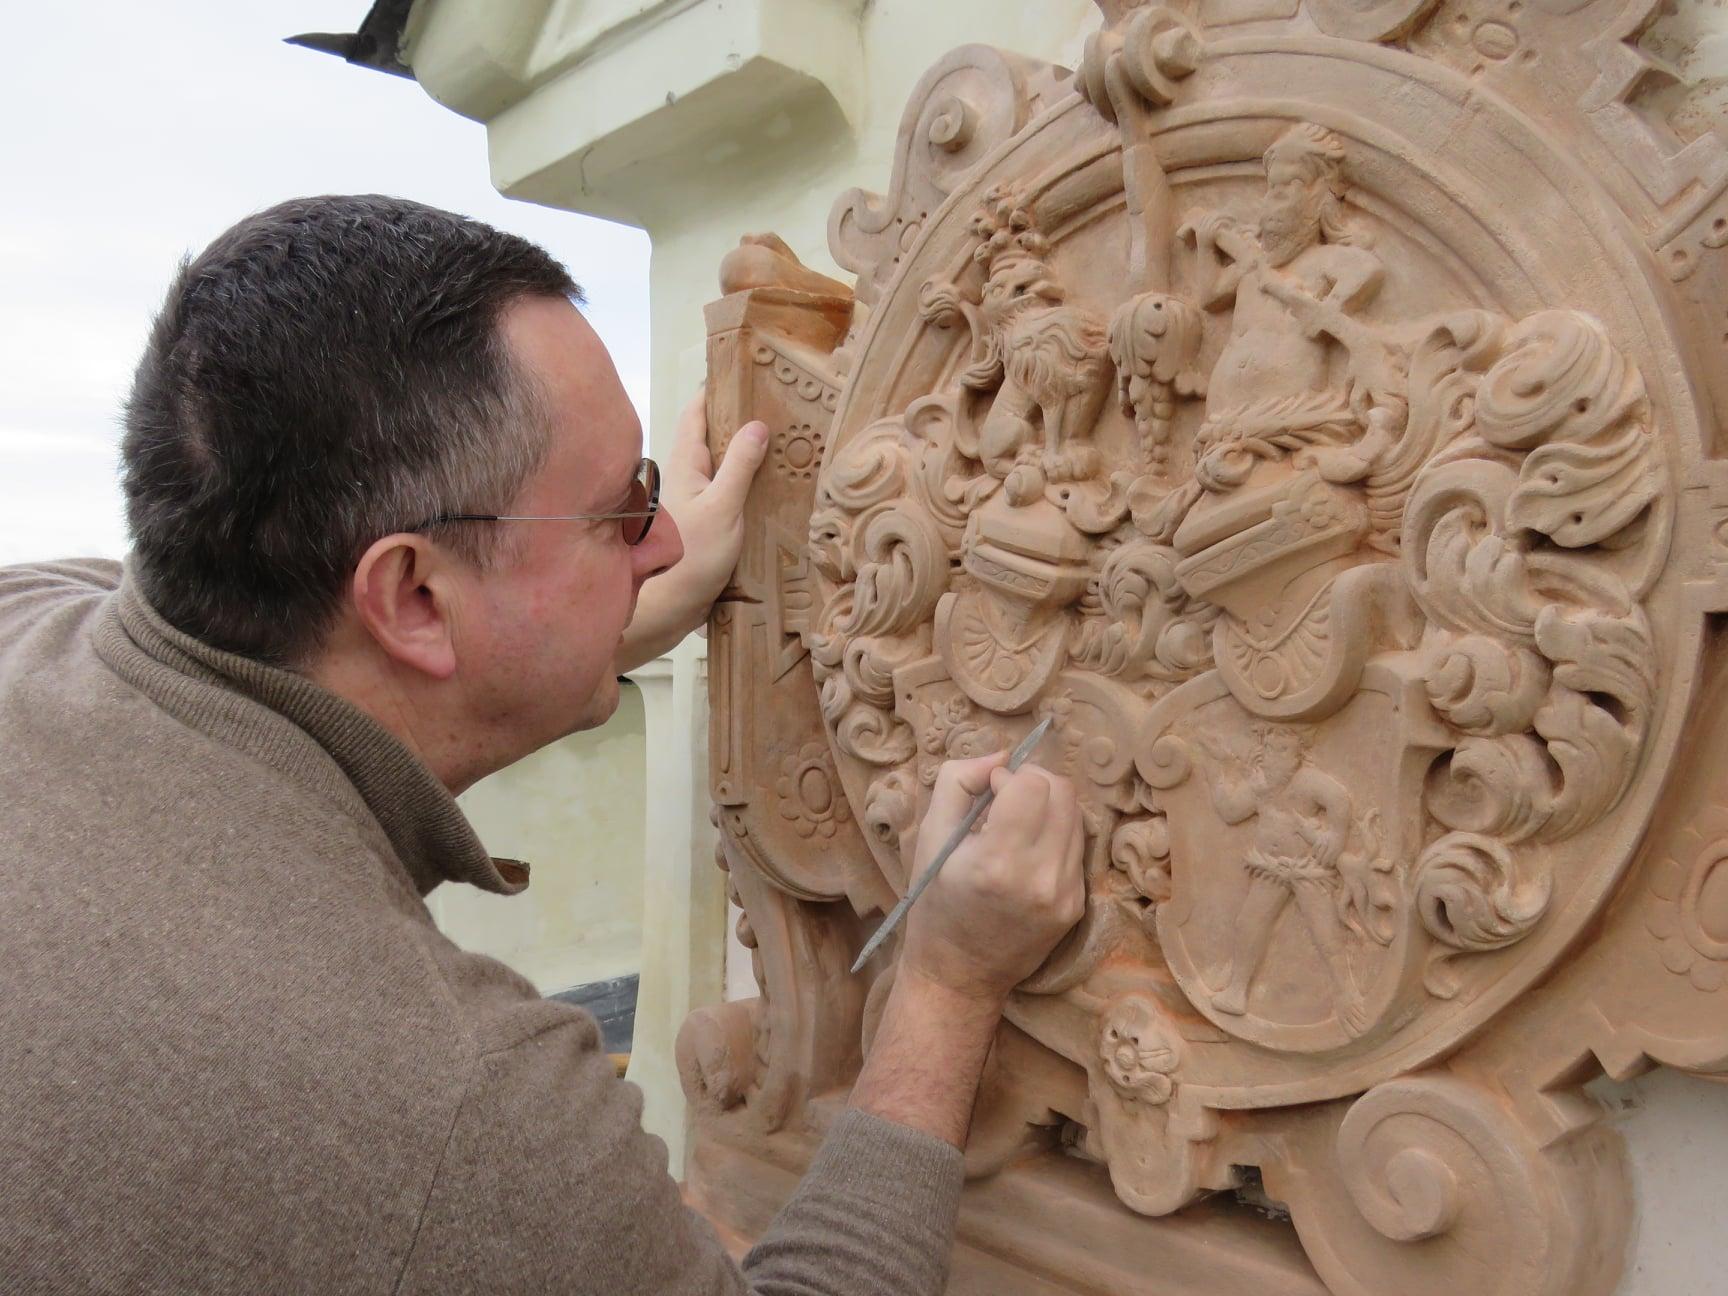 création de blason sculpture de blason Patrick Kalita sculpteur héraldique armoiries blason patrick